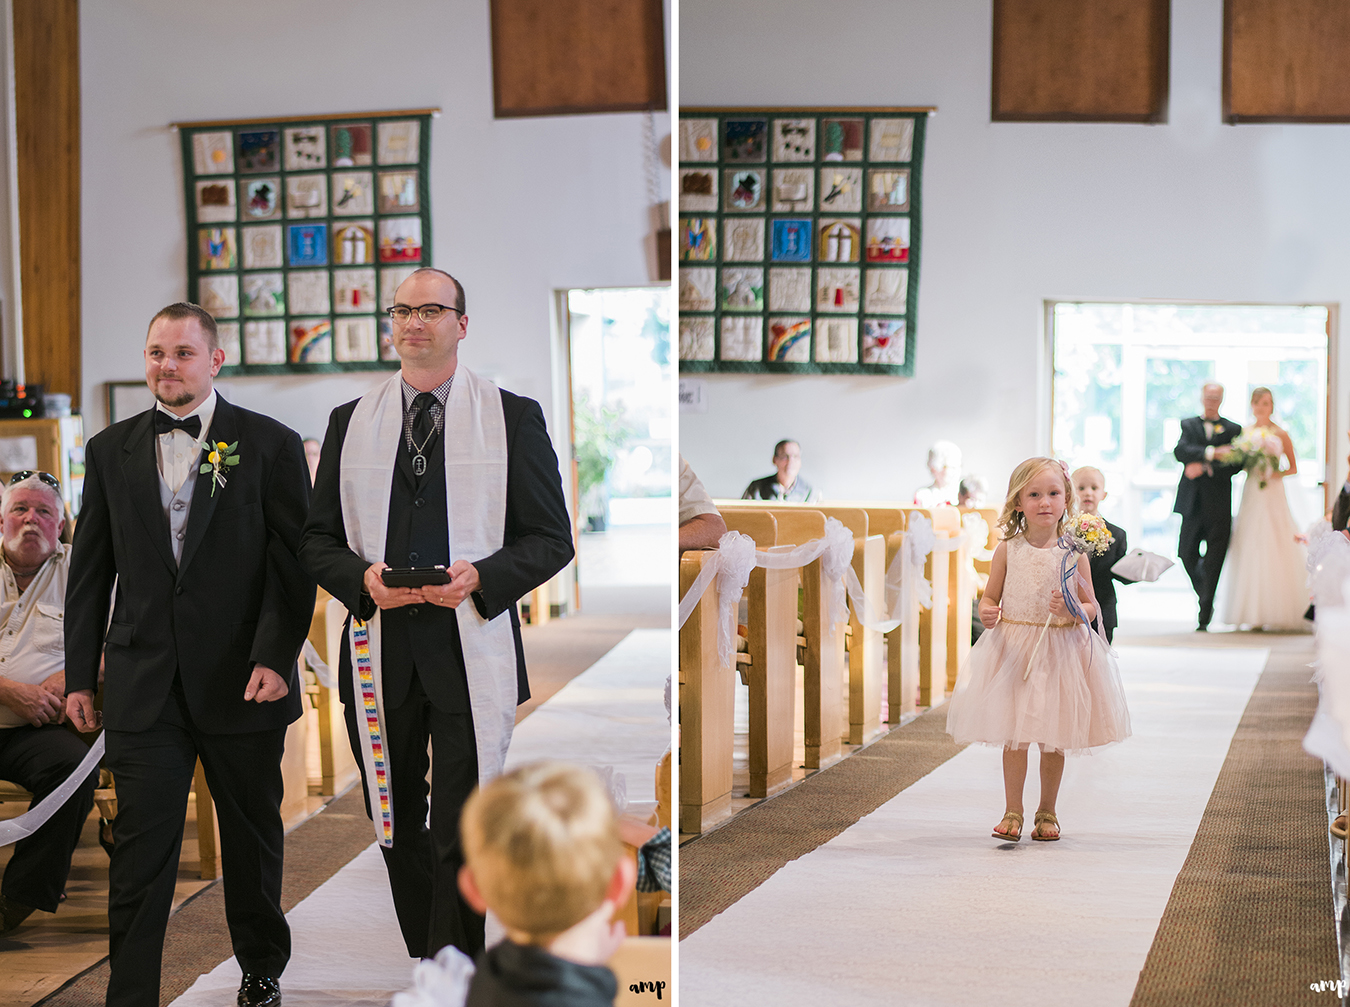 Groom and flower girl walk down the aisle